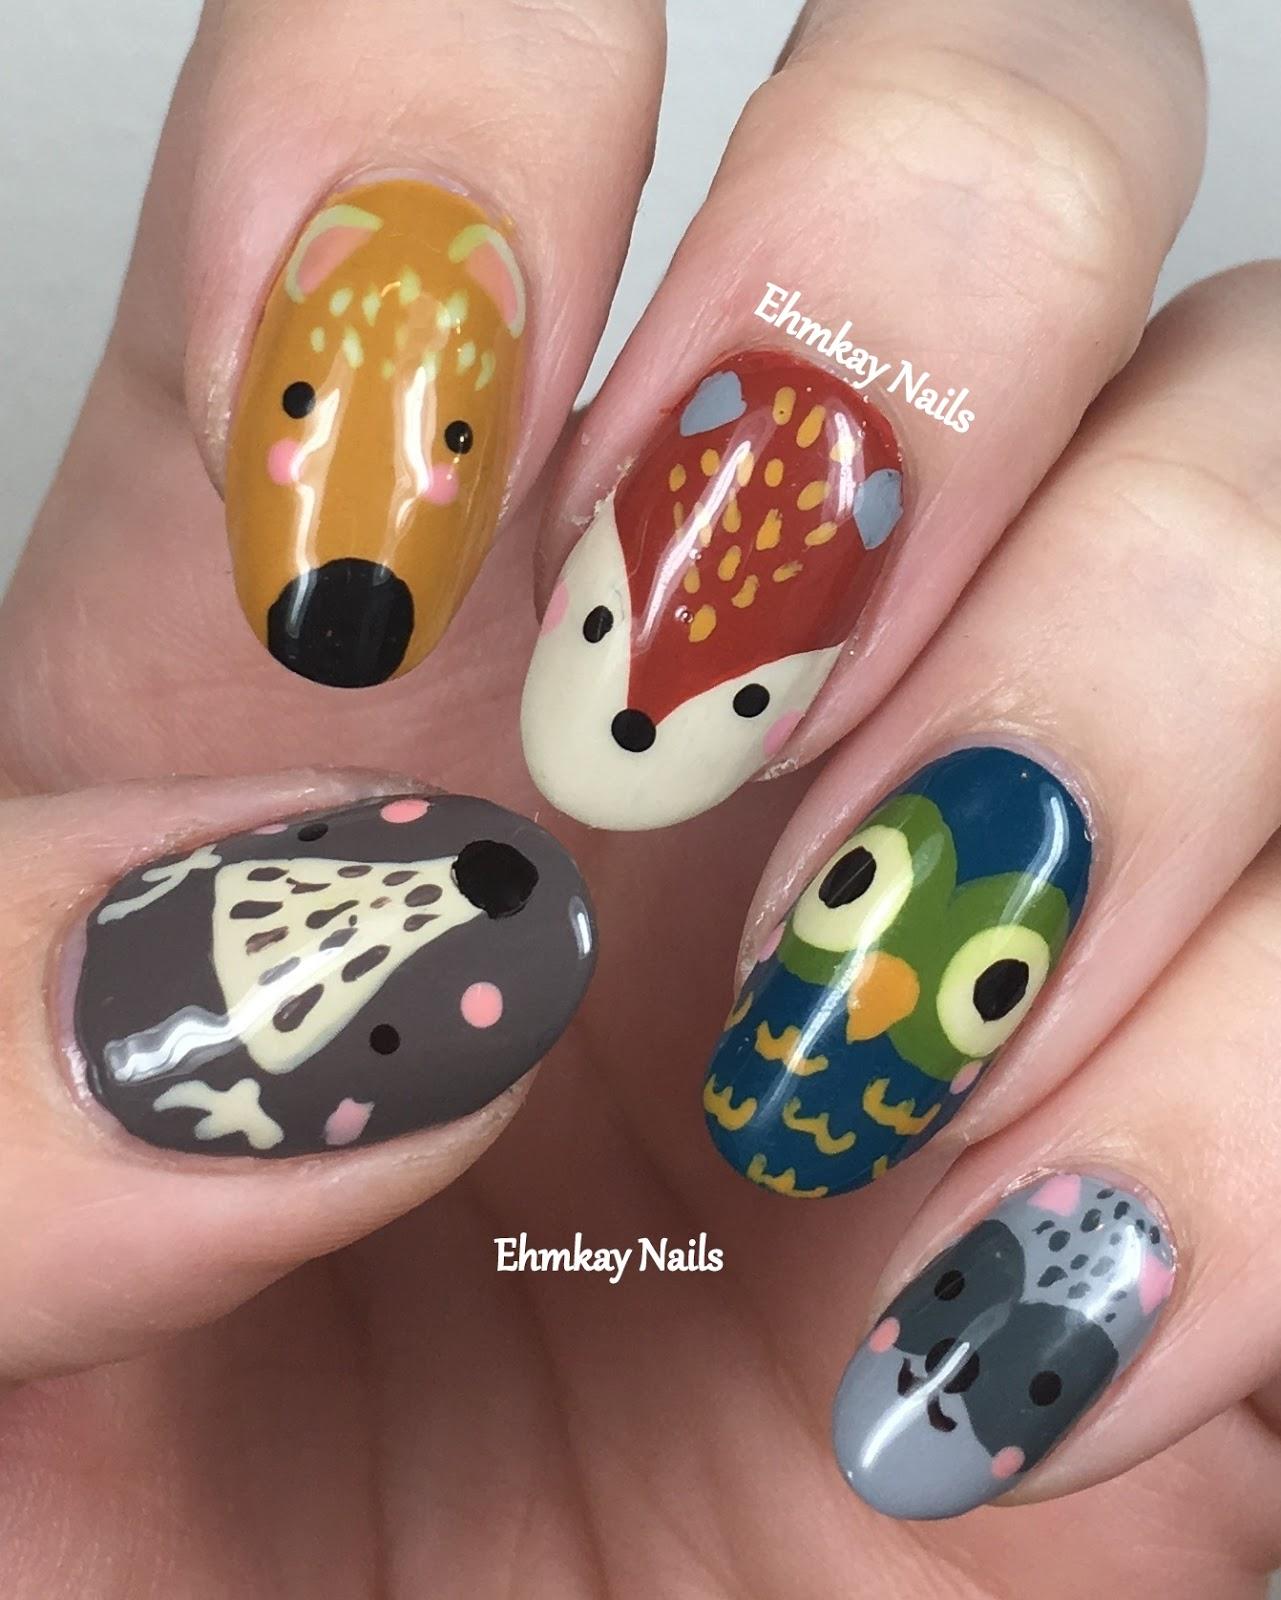 Ehmkay nails woodland creatures nail art with girly bits autumn woodland creatures nail art with girly bits autumn cremes prinsesfo Gallery